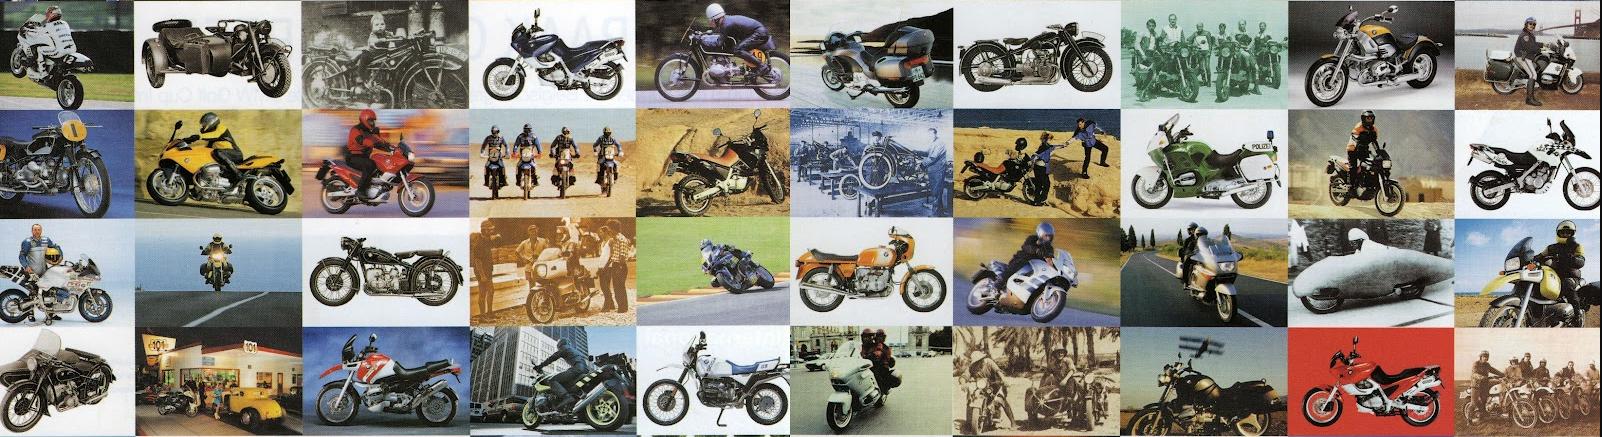 Assistenza BMW Motorrad